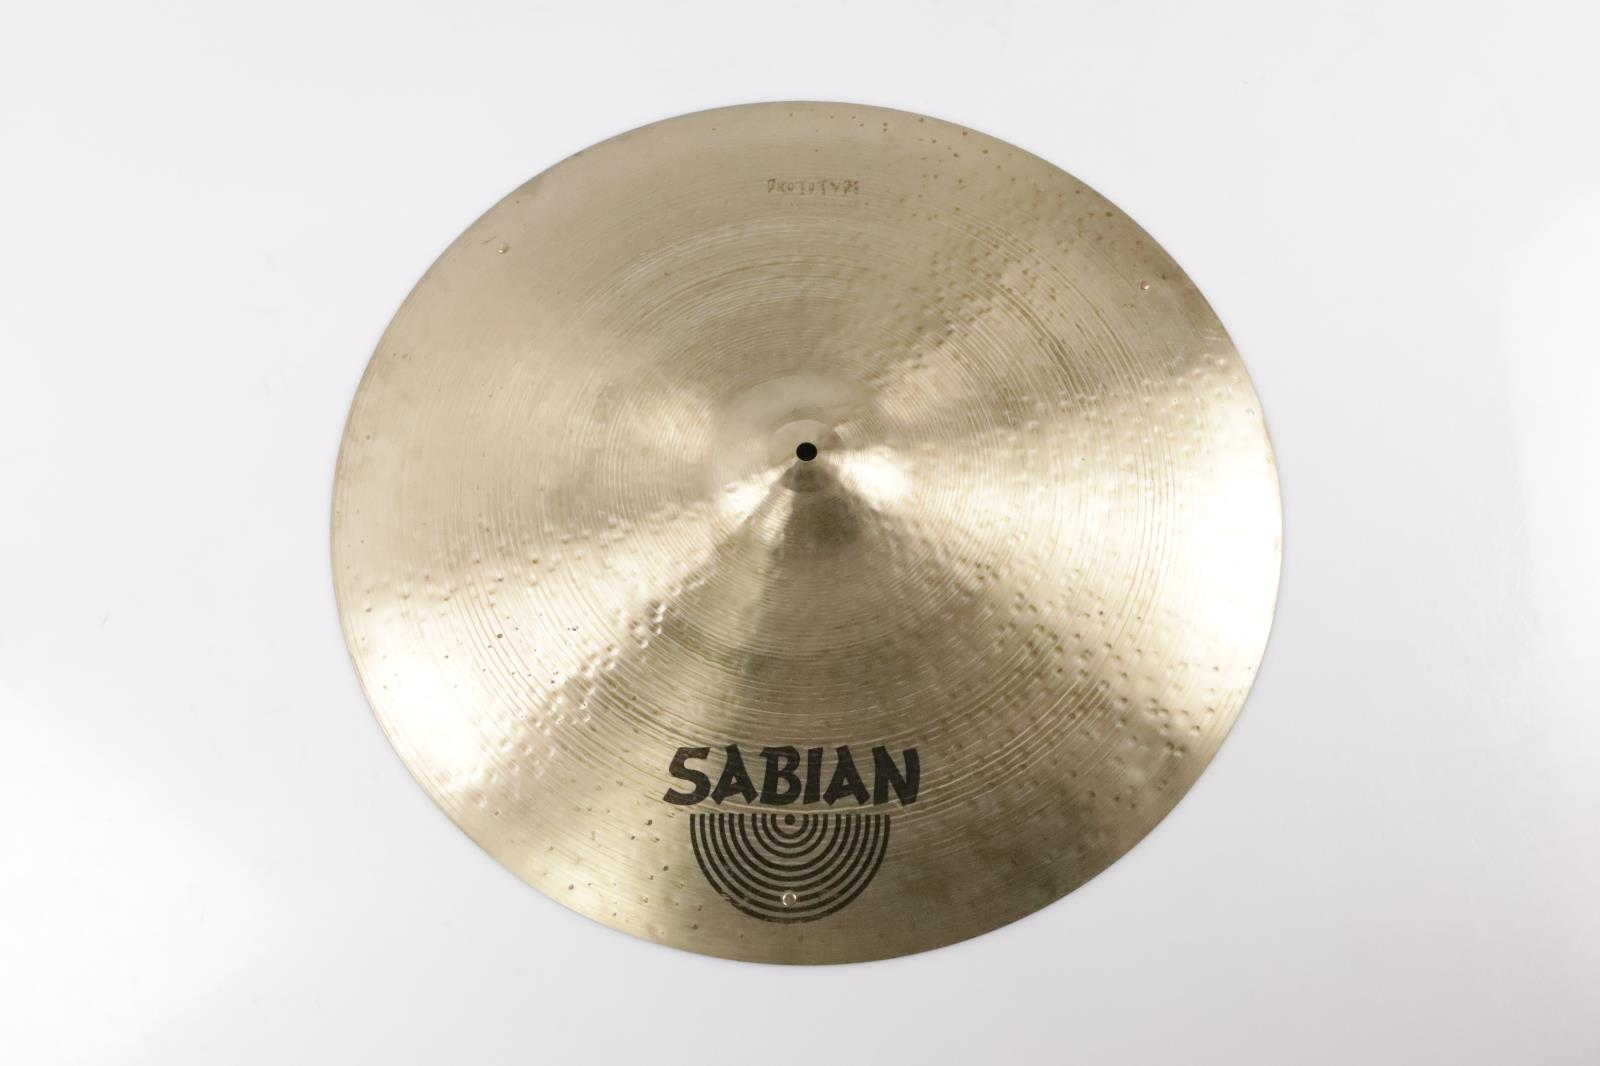 "Sabian 24"" Ride Prototype w/ Rivets Cymbal Dave Krusen #34826"